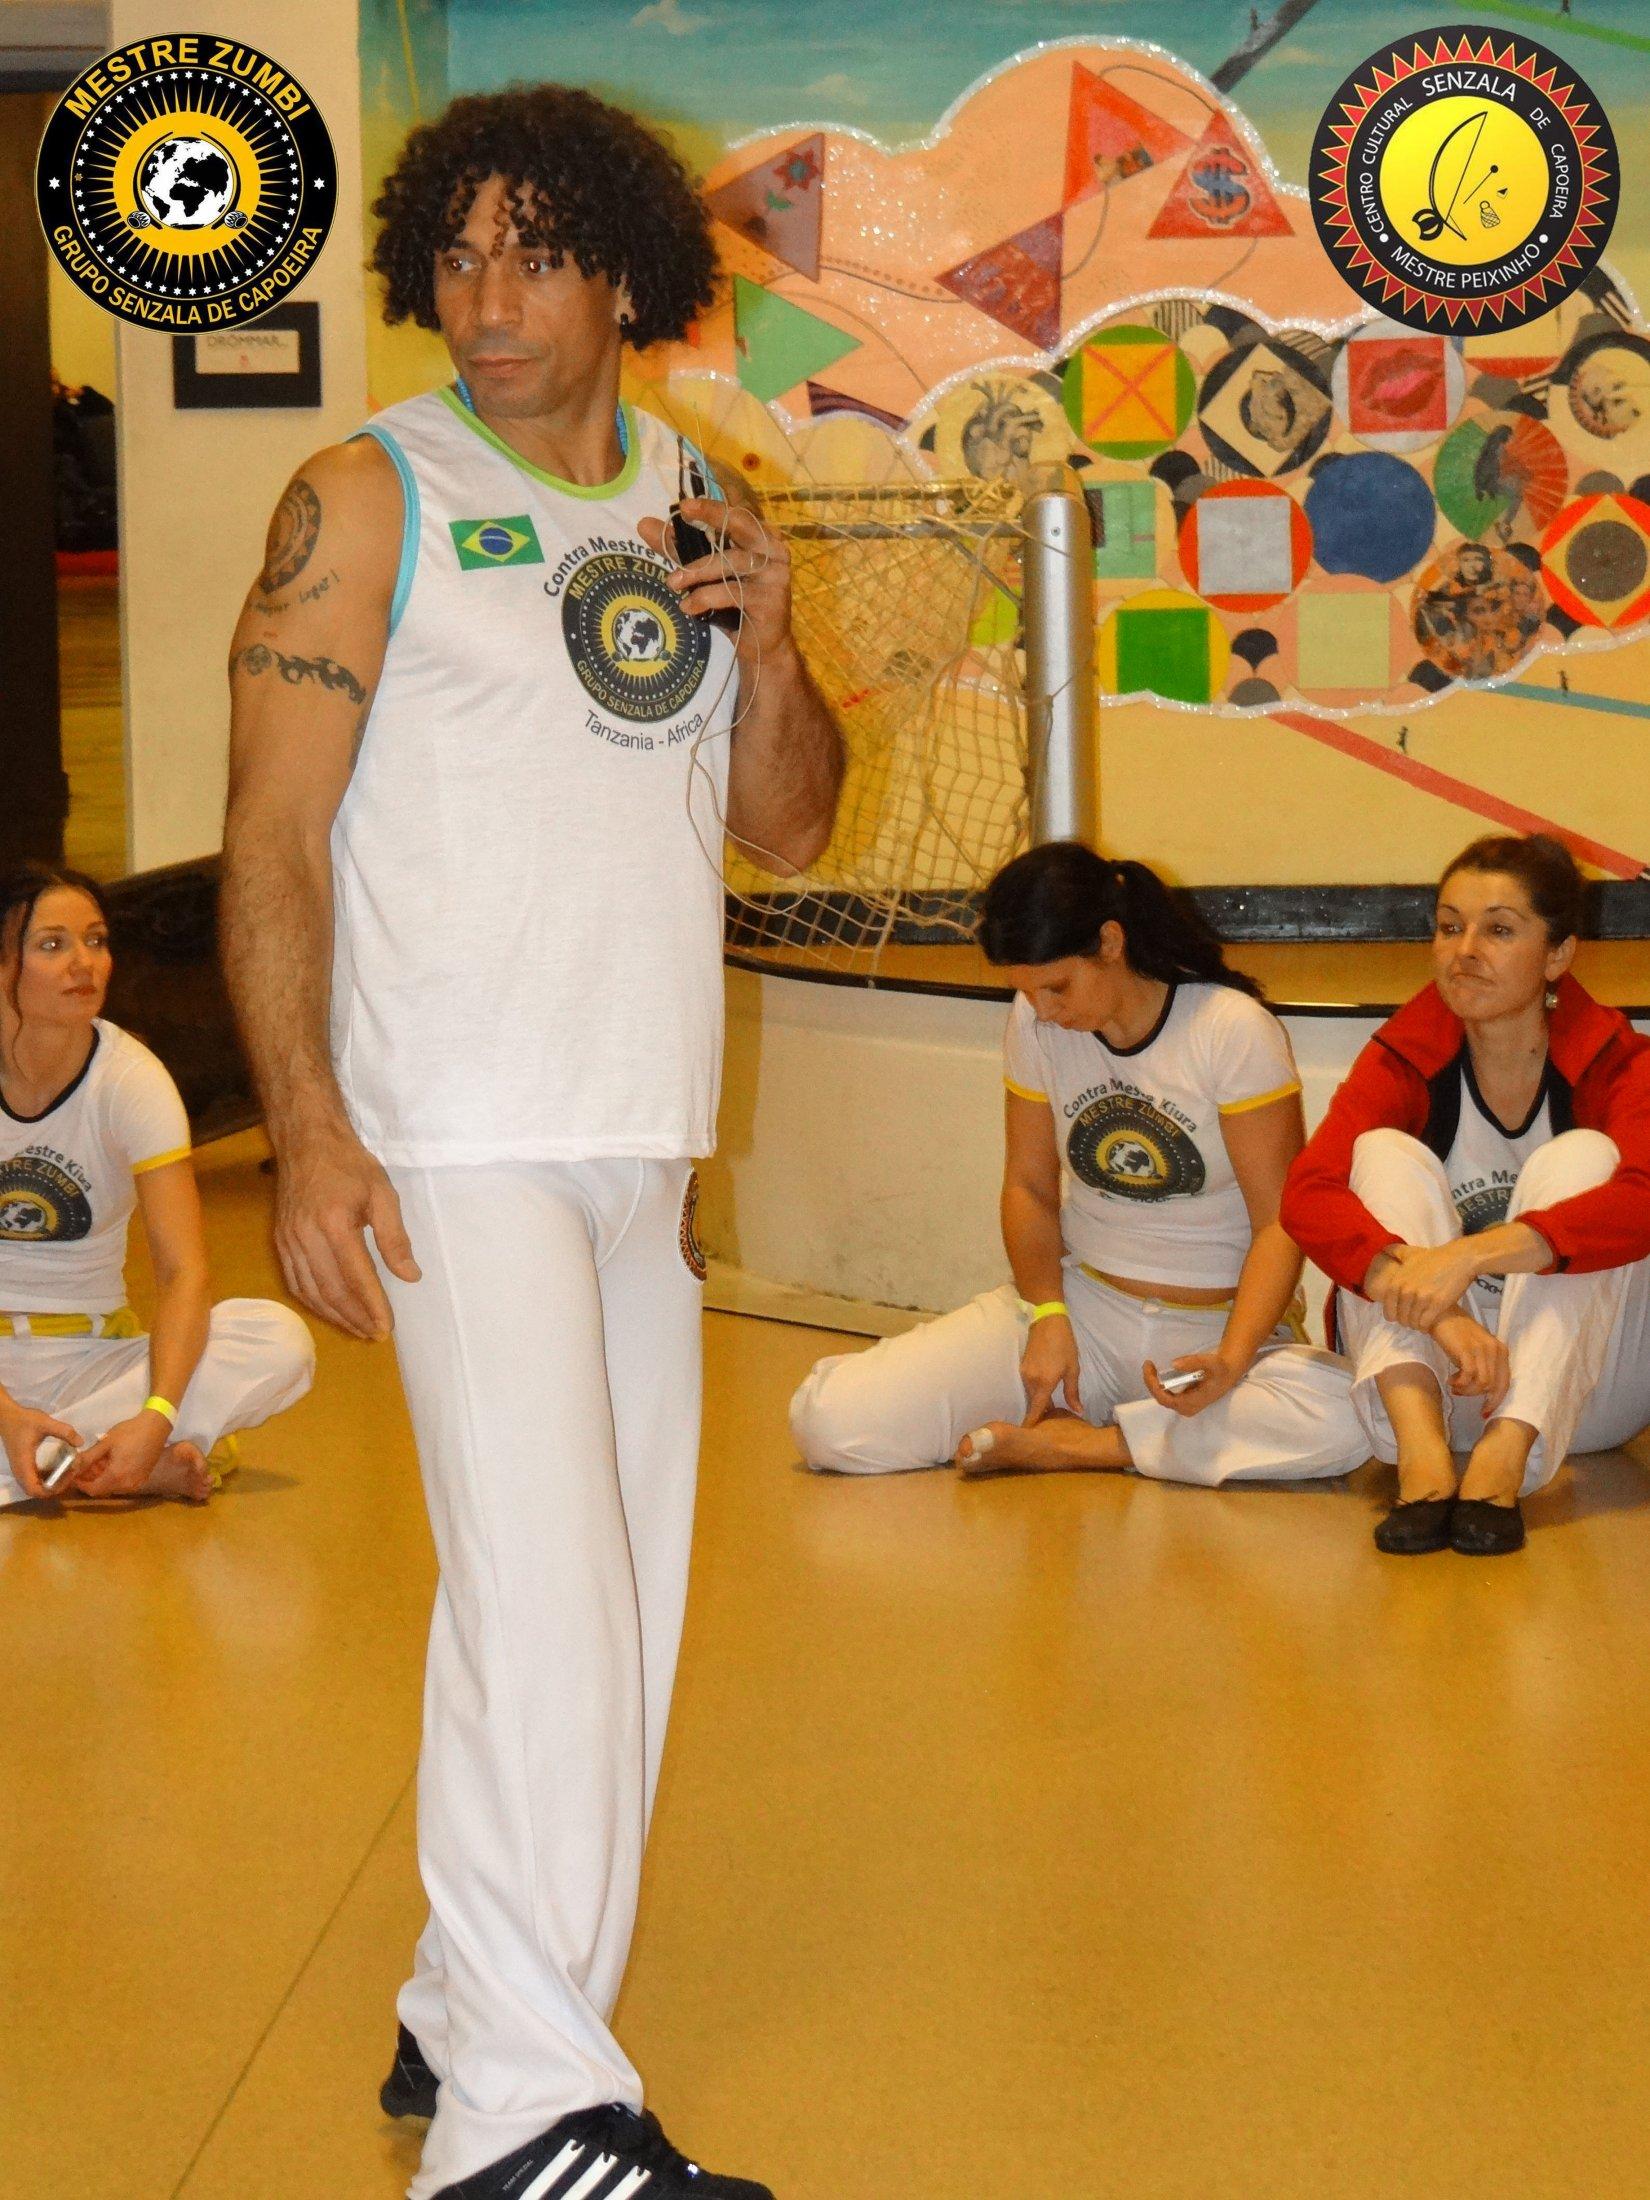 2013-12-14 - Capoeira 013